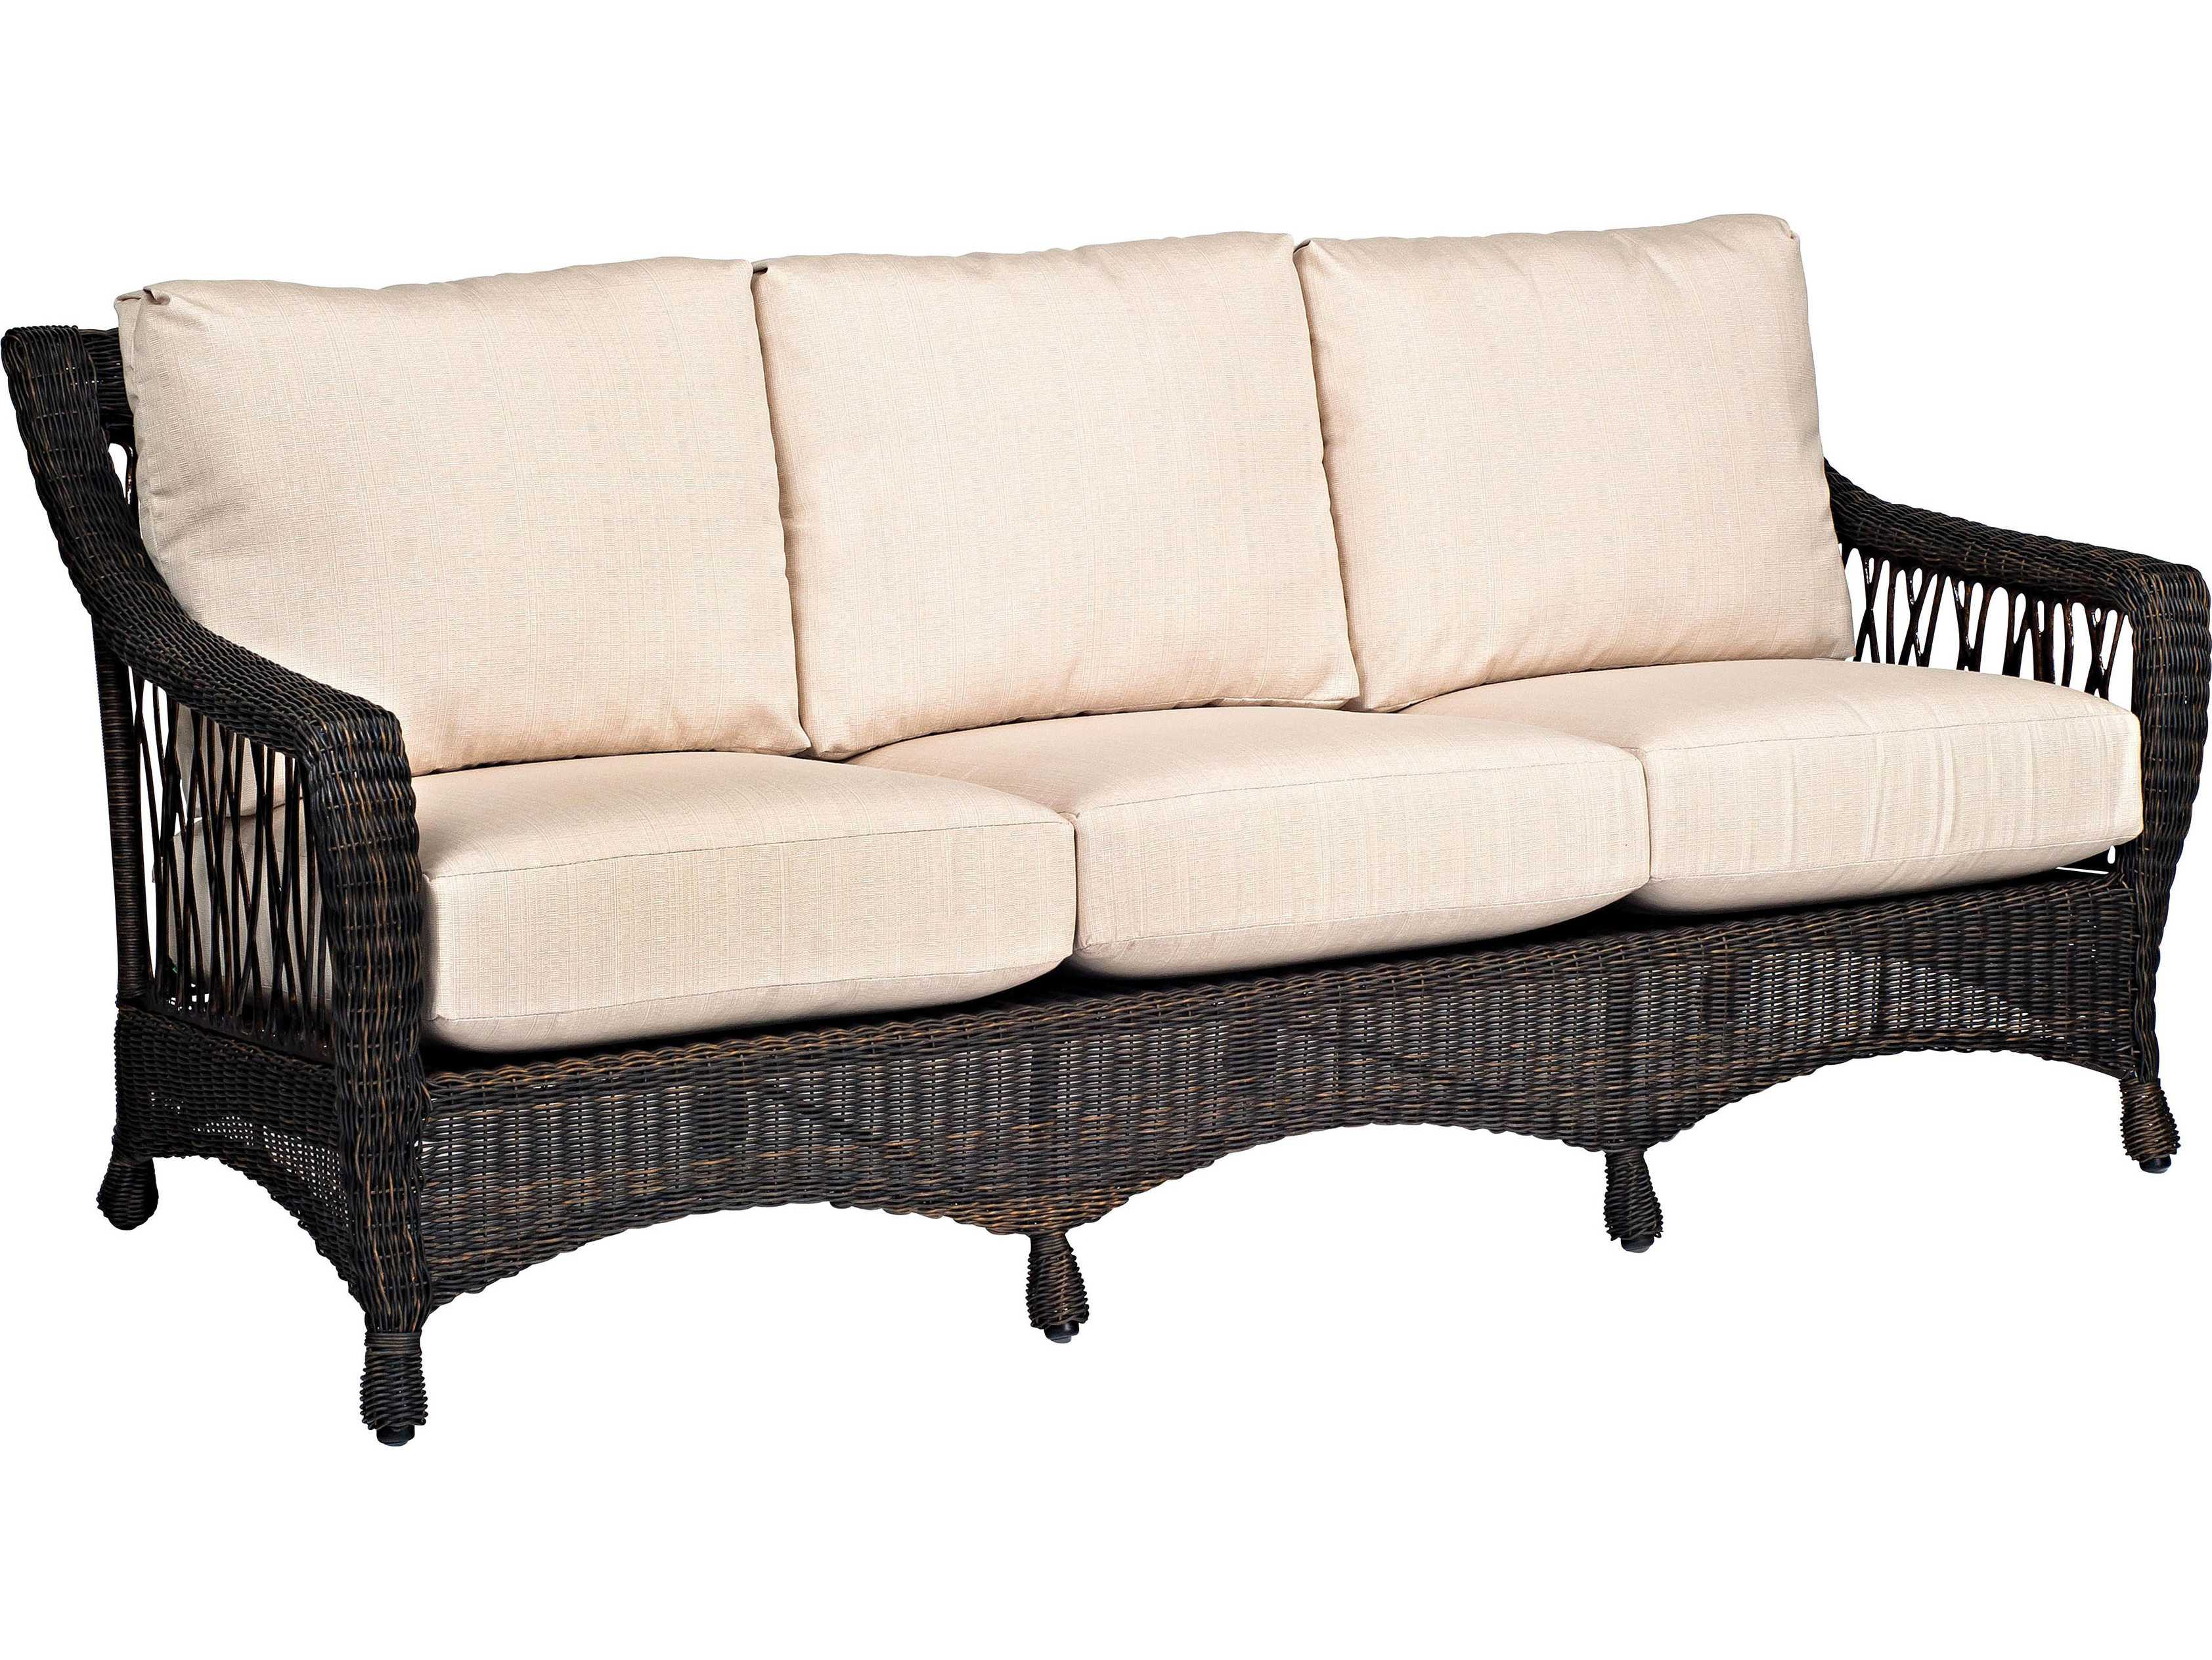 woodard serengeti sofa replacement cushions 91w020. Black Bedroom Furniture Sets. Home Design Ideas